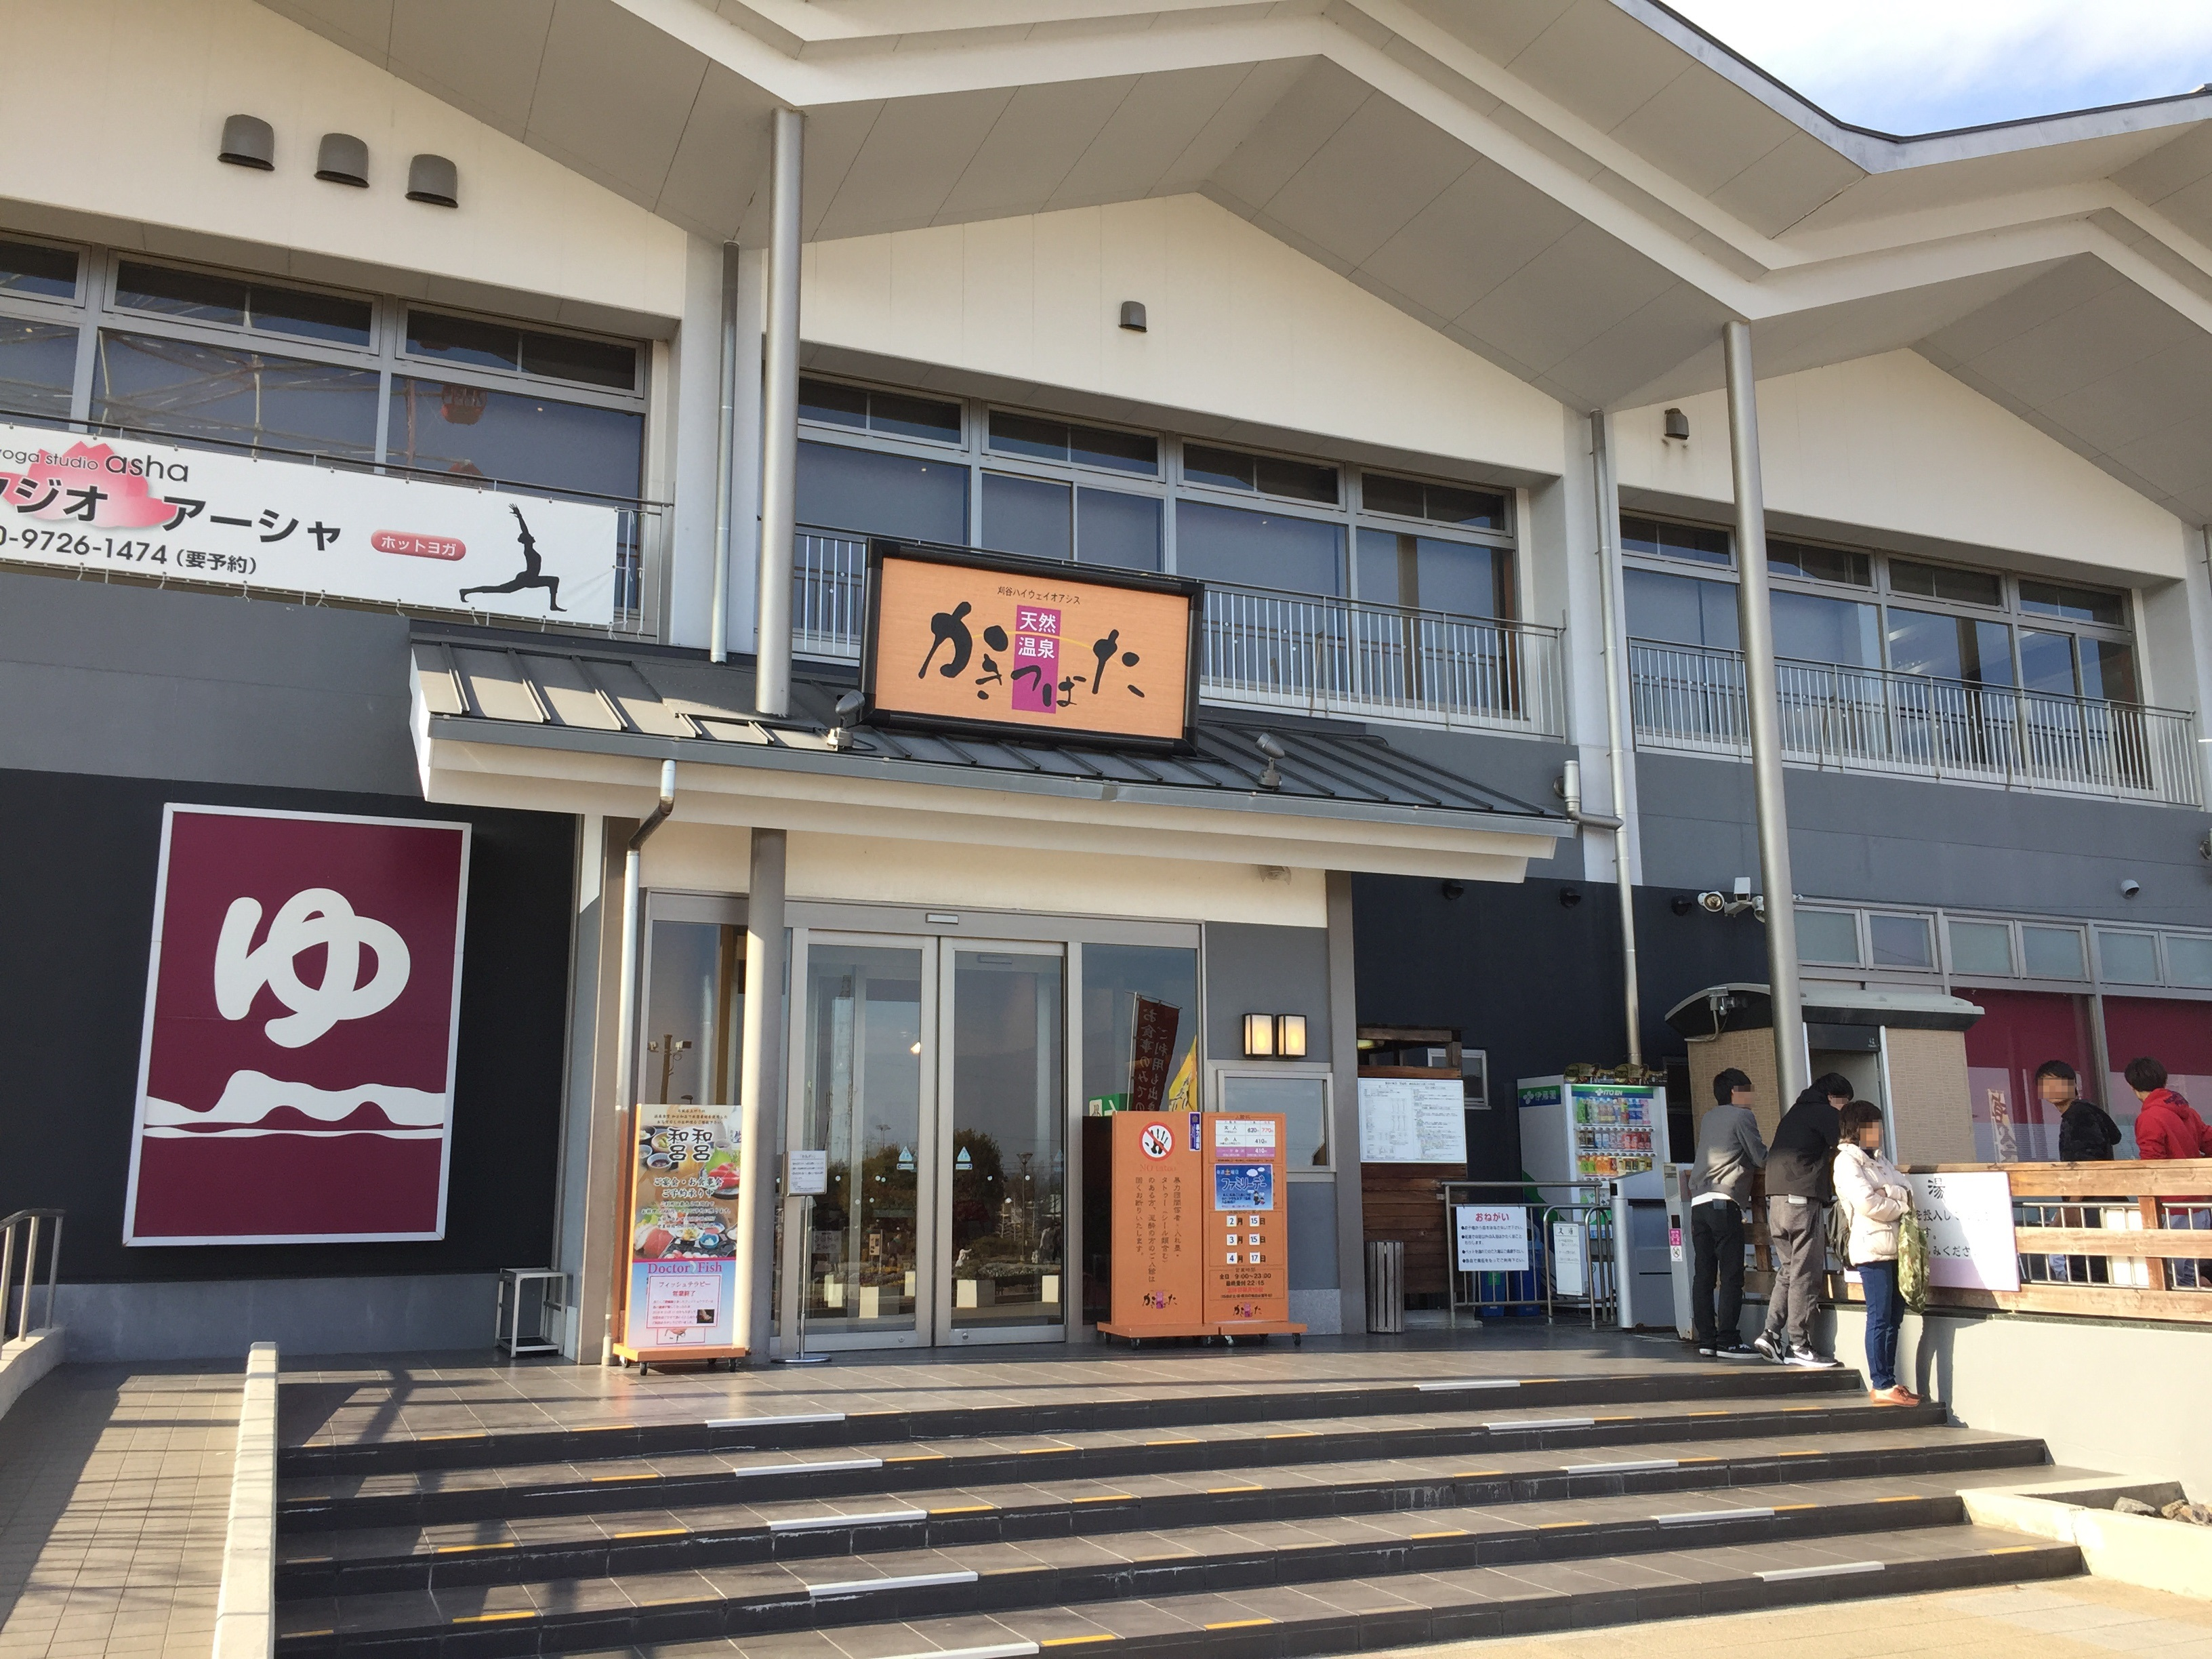 kariya-highway-oasis-onsen